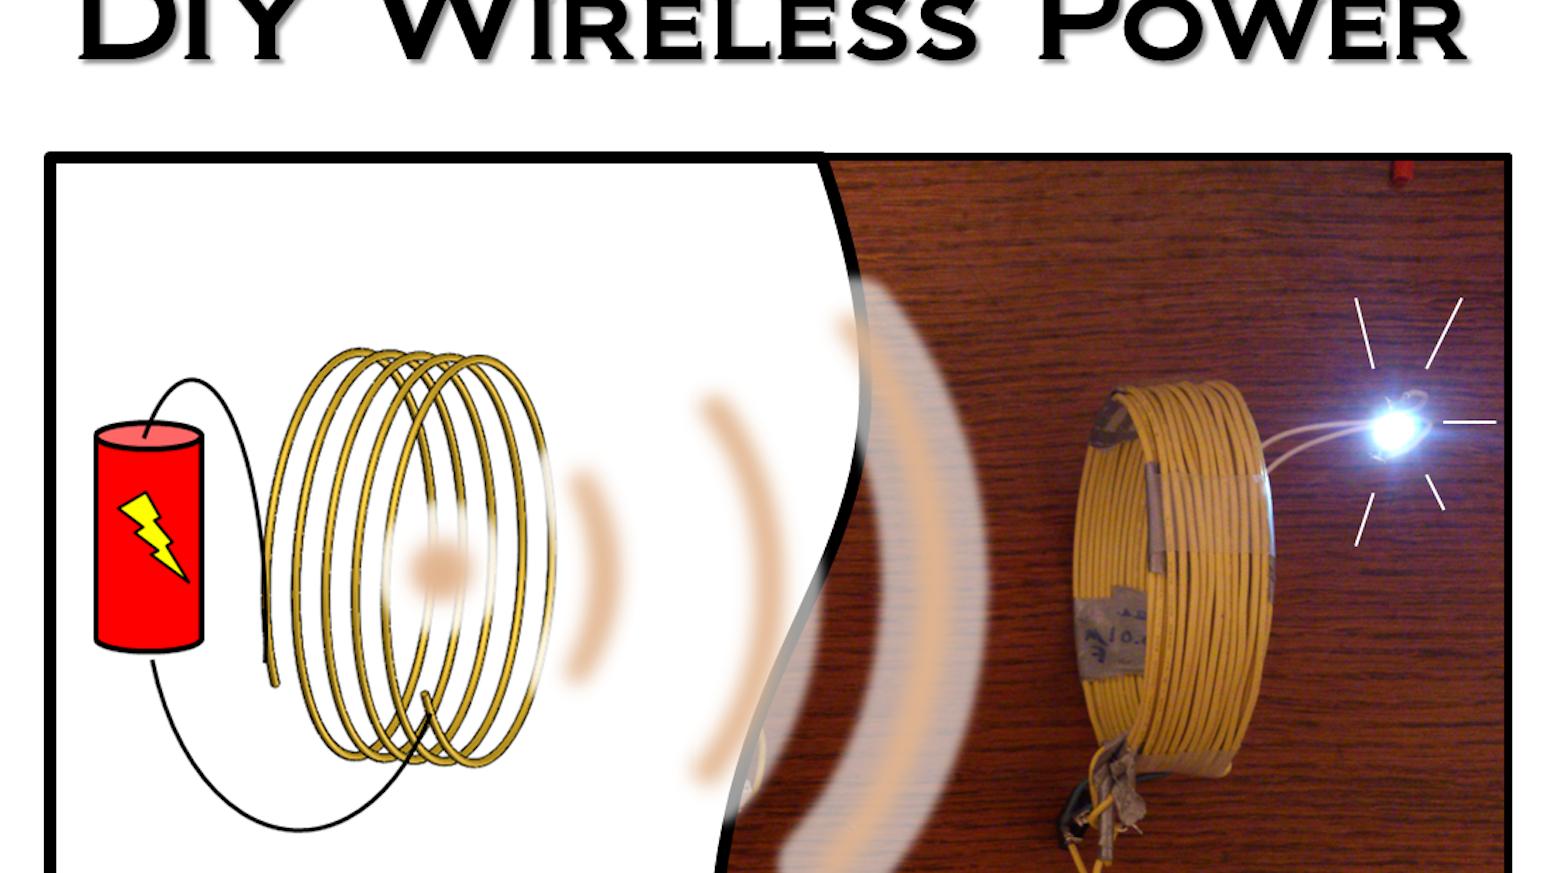 Wireless Power Hobby Kit By Jonathan Byron Kickstarter Us Electronic Circuits Tutorials Engineering Projects